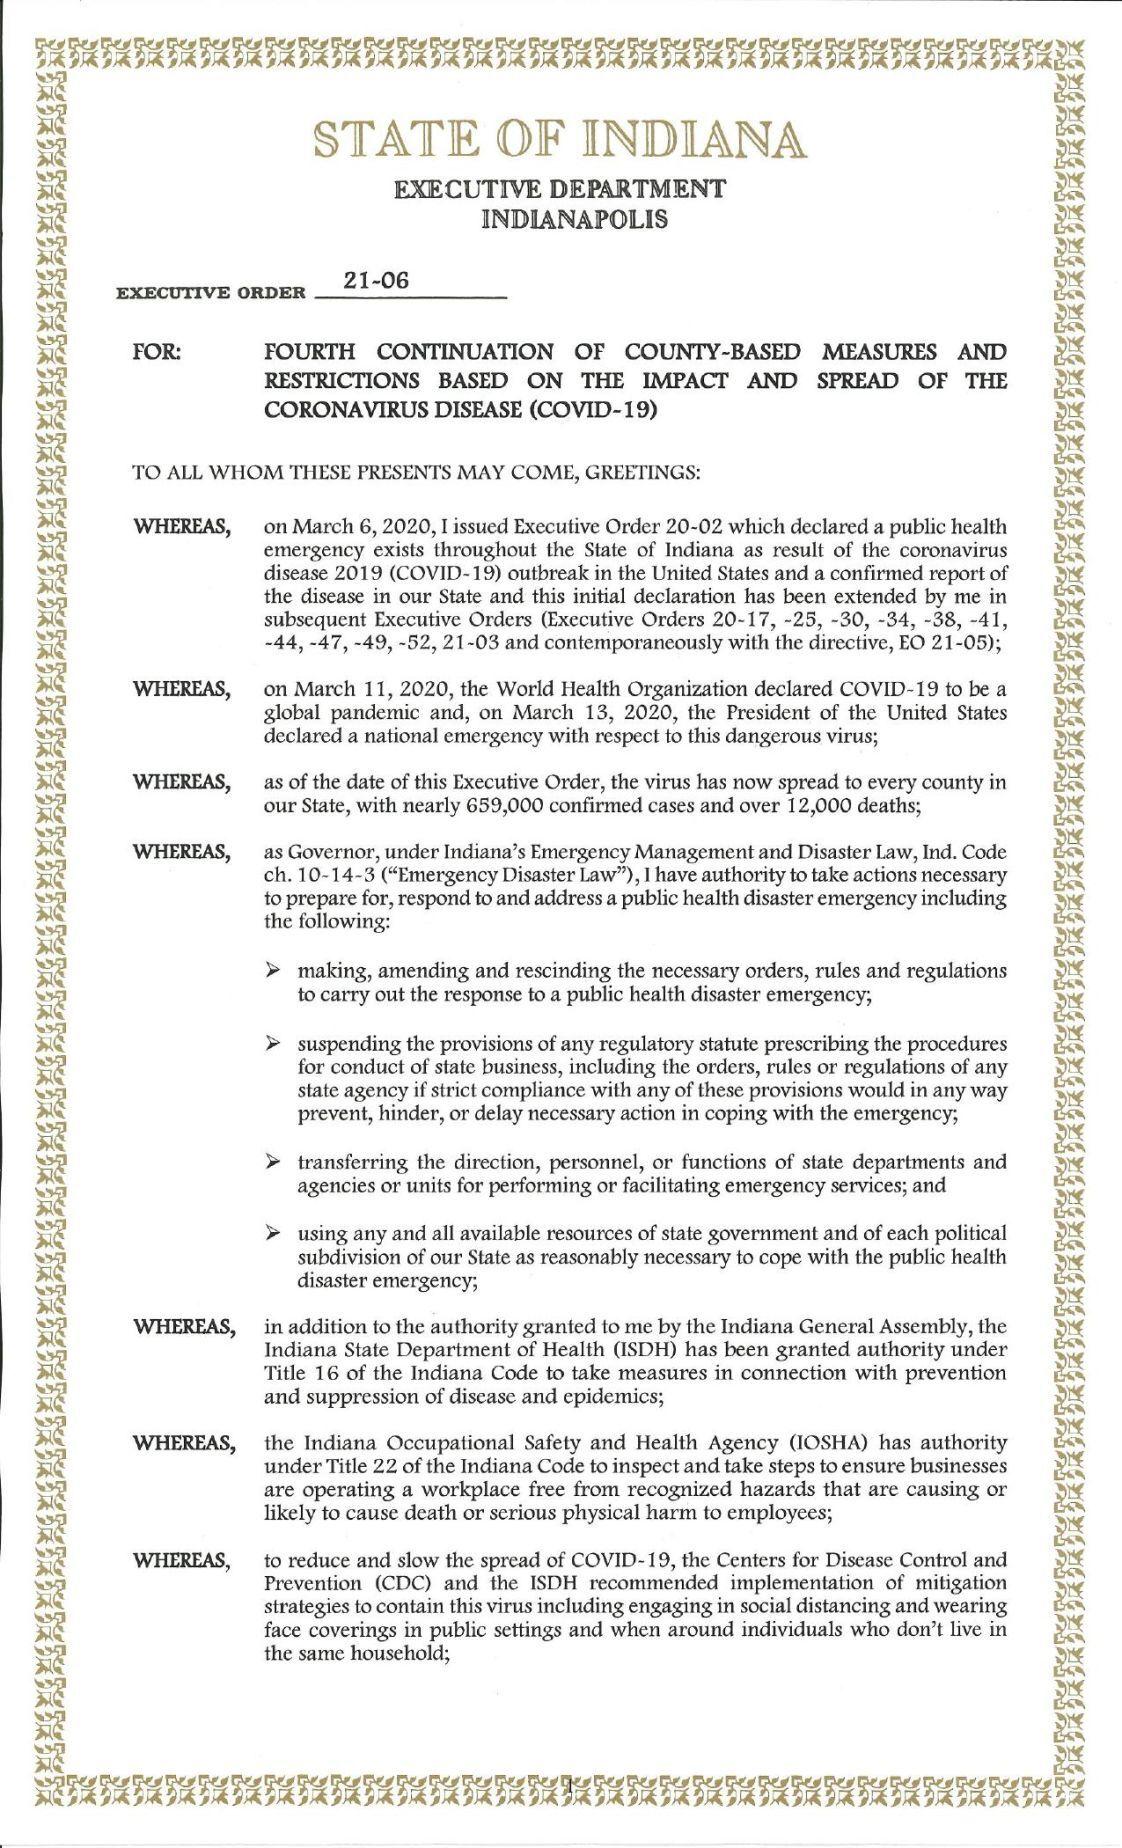 Gov. Eric Holcomb Executive Order 21-06